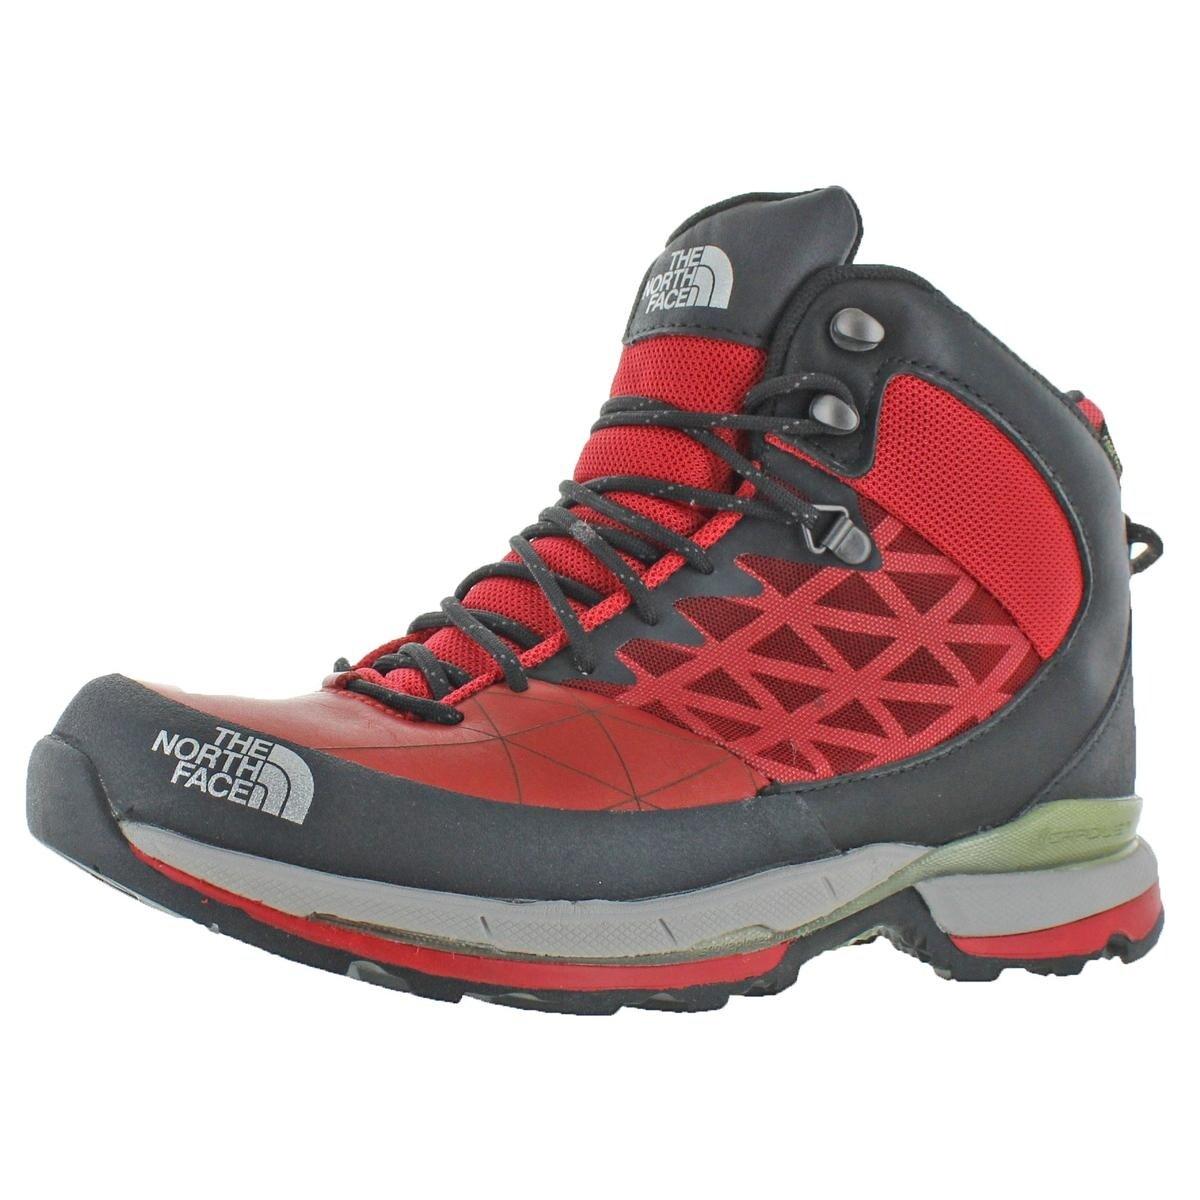 1465610ec The North Face Mens Havoc Mid GTX XCR Hiking Boots Leather Gore-Tex - 8  Medium (D)